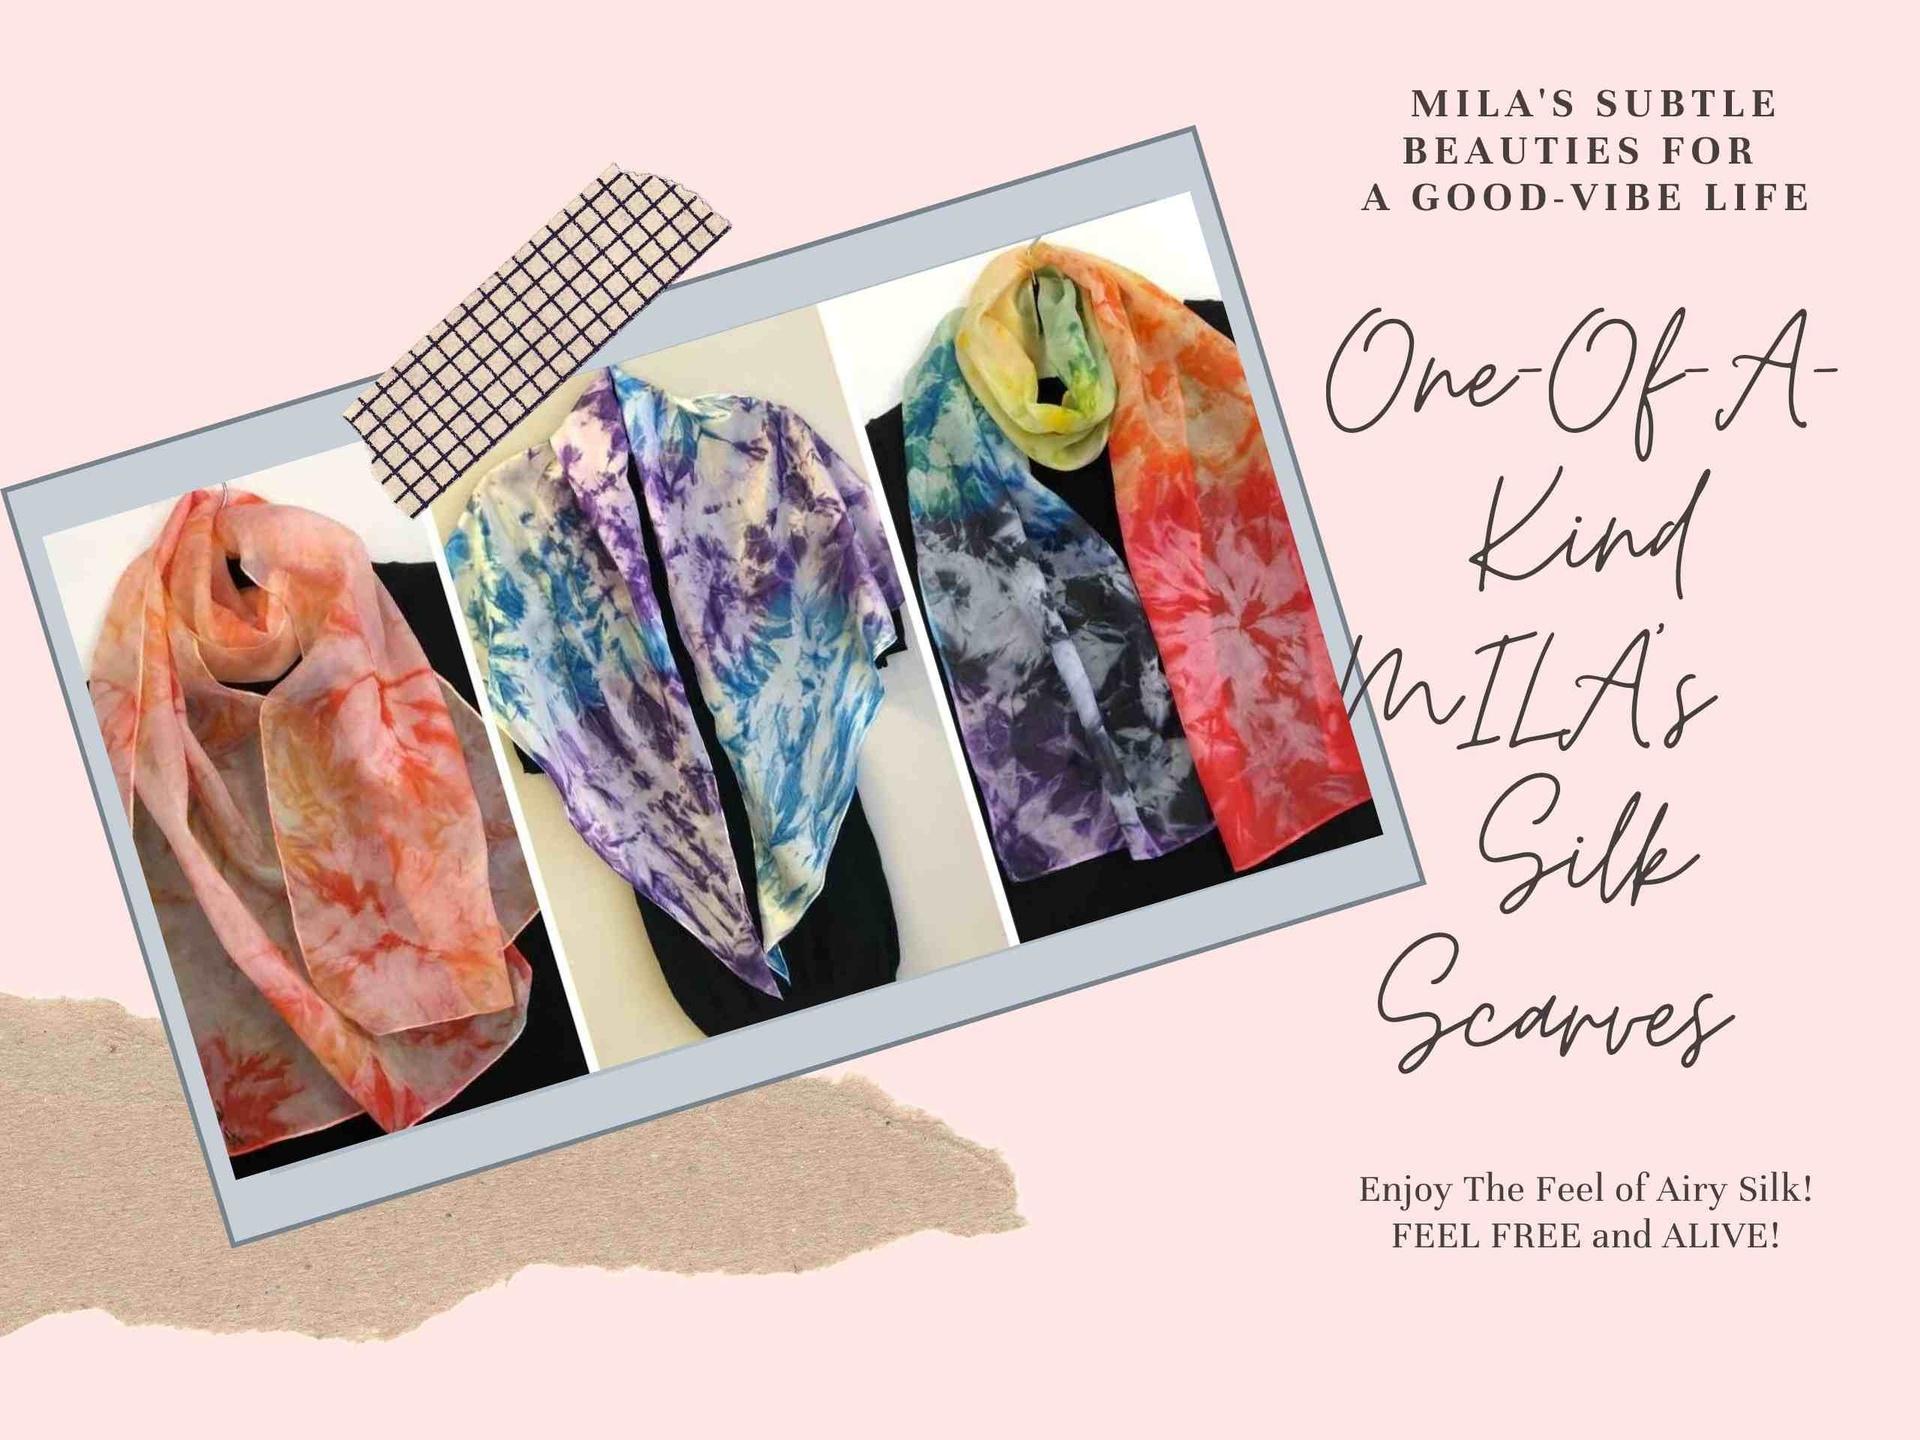 Image of Mila Lansdowne Designer Silk Scarves with text saying Enjoy The Luxurious Silk Scarves